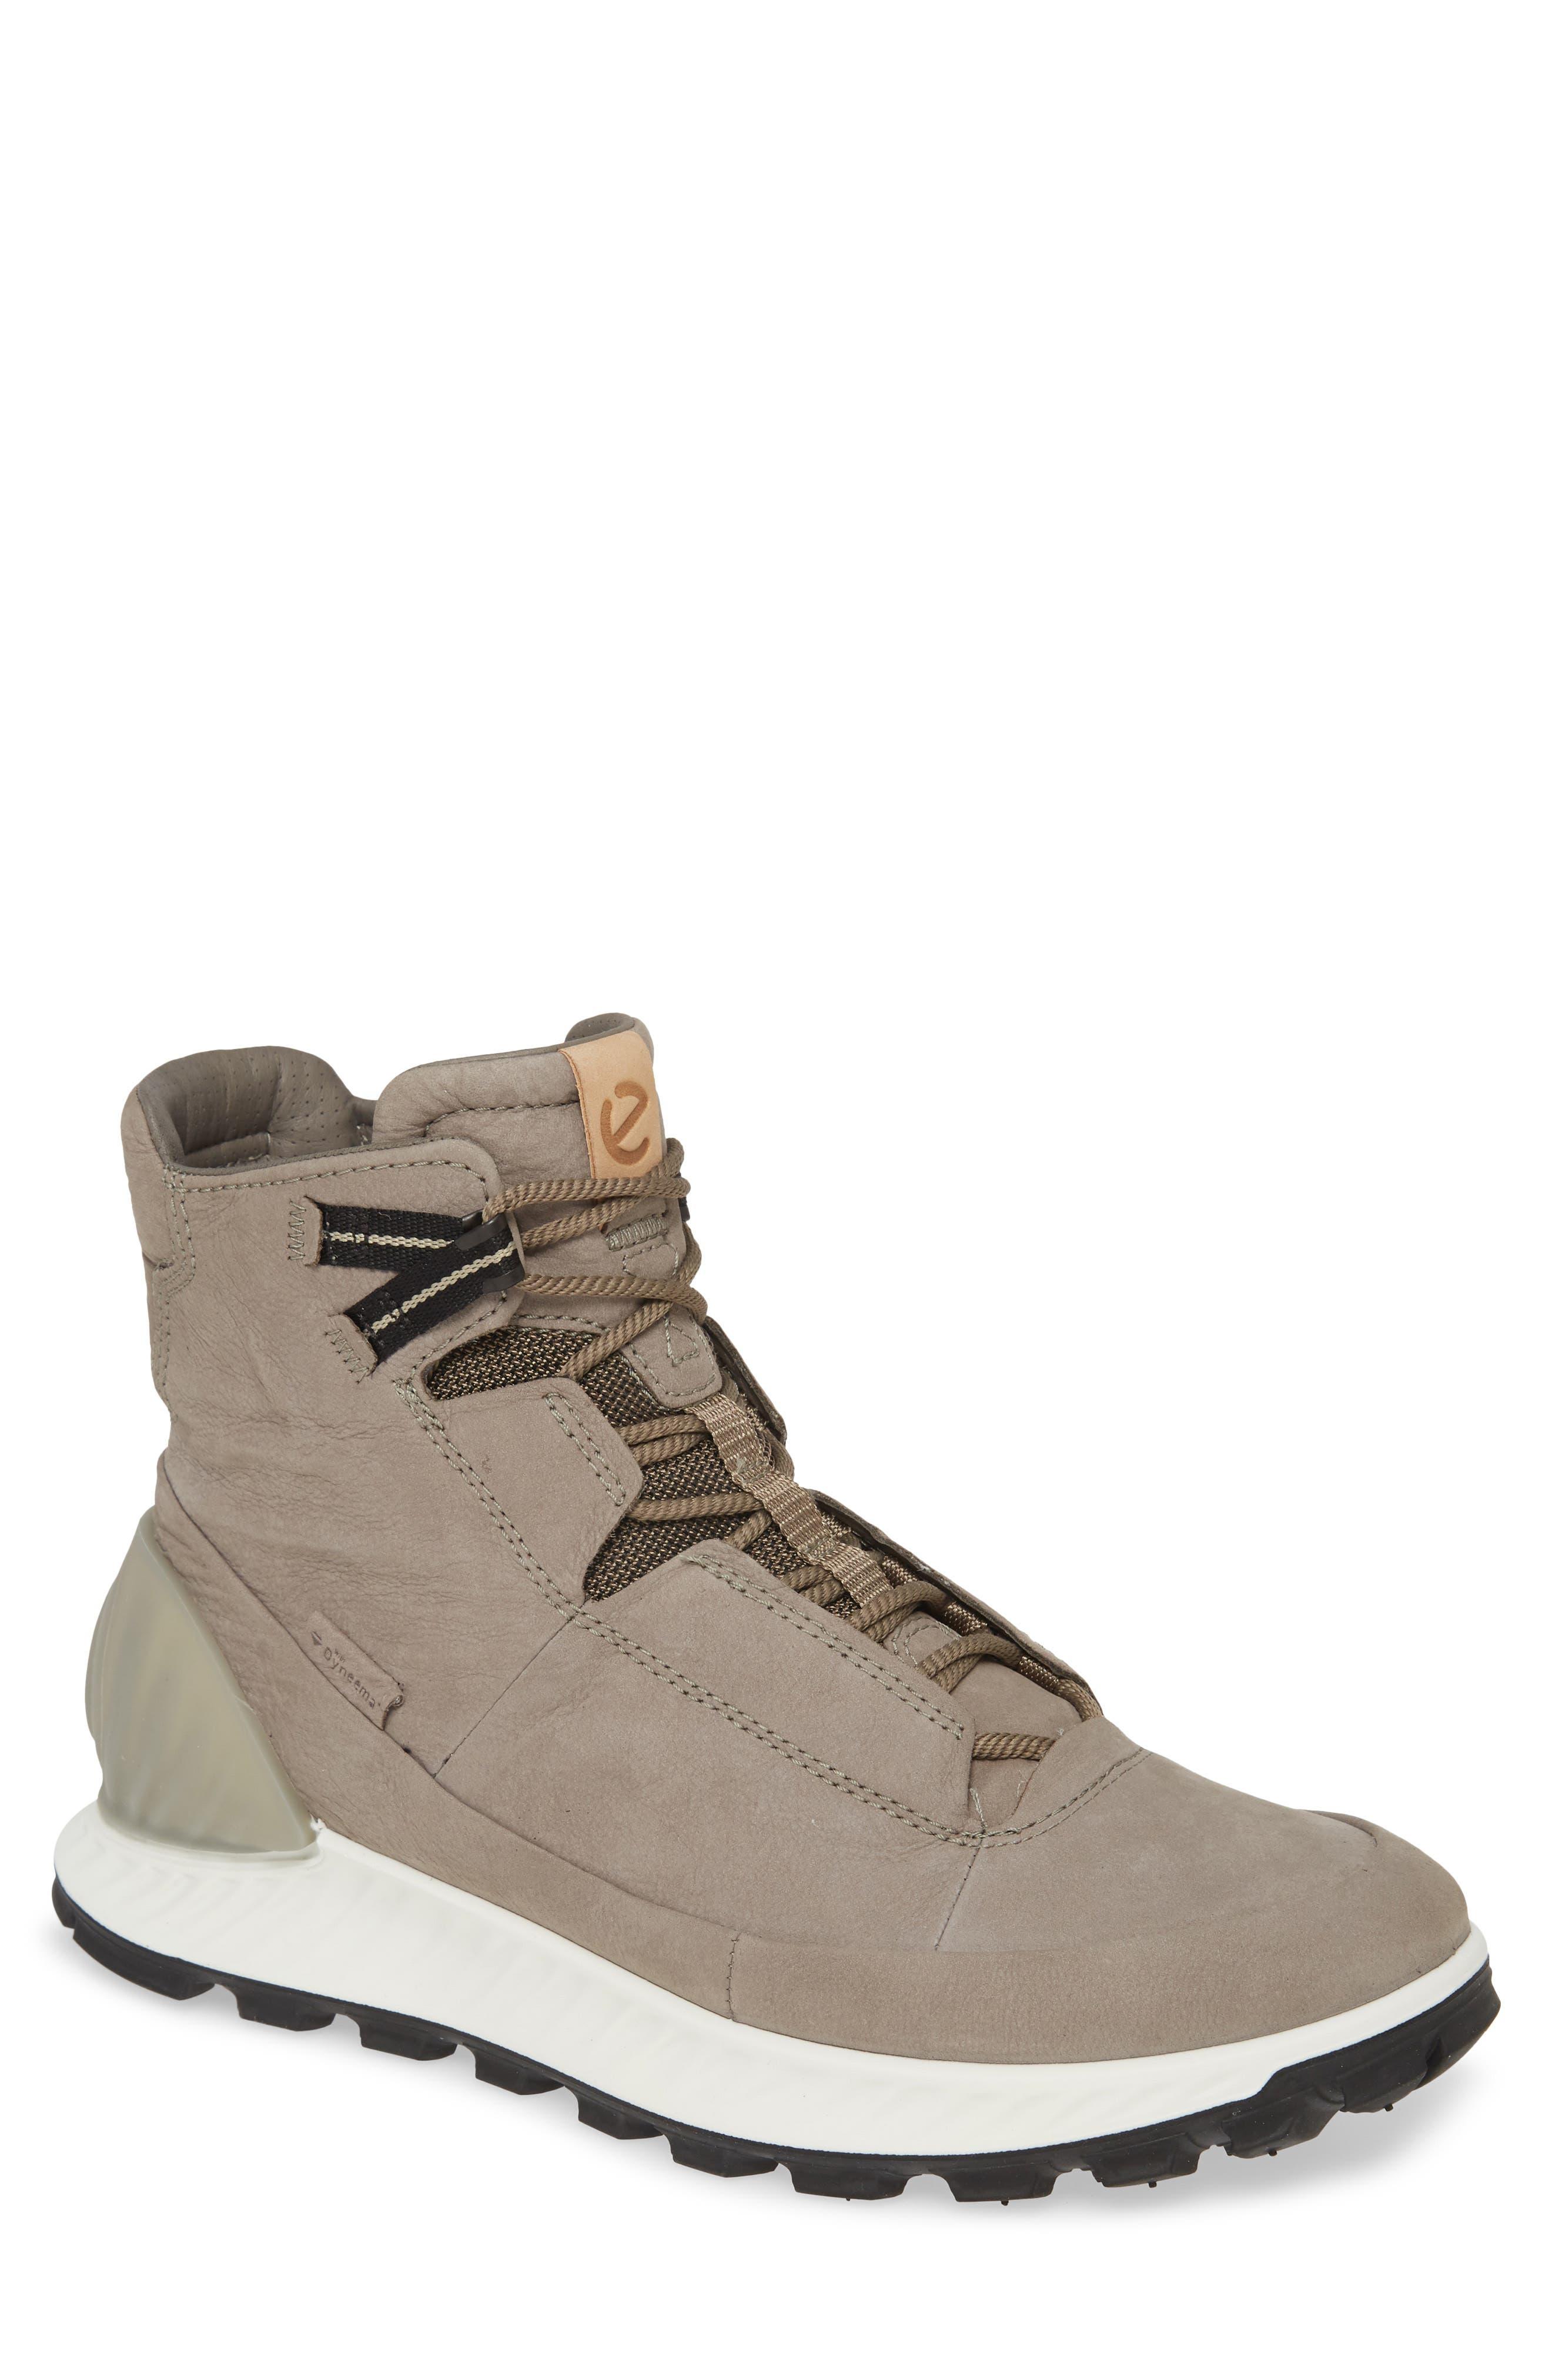 ECCO Men's Ecco Limited Edition Exostrike Dyneema Sneaker Boot, Size 9-9.5US - Grey